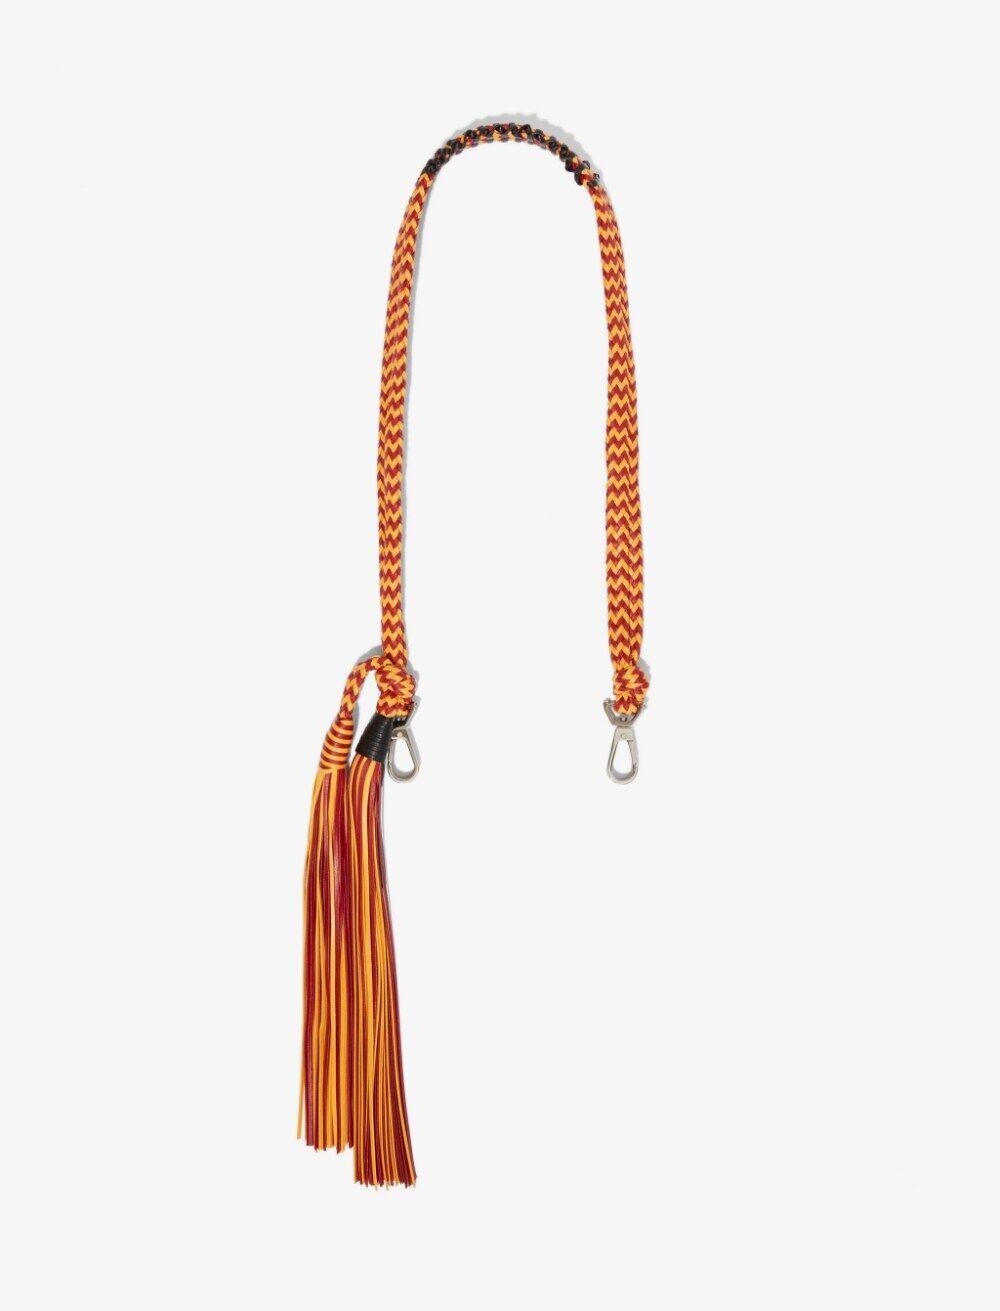 Proenza Schouler Woven Cording Strap lemon chrome/rust/yellow One Size